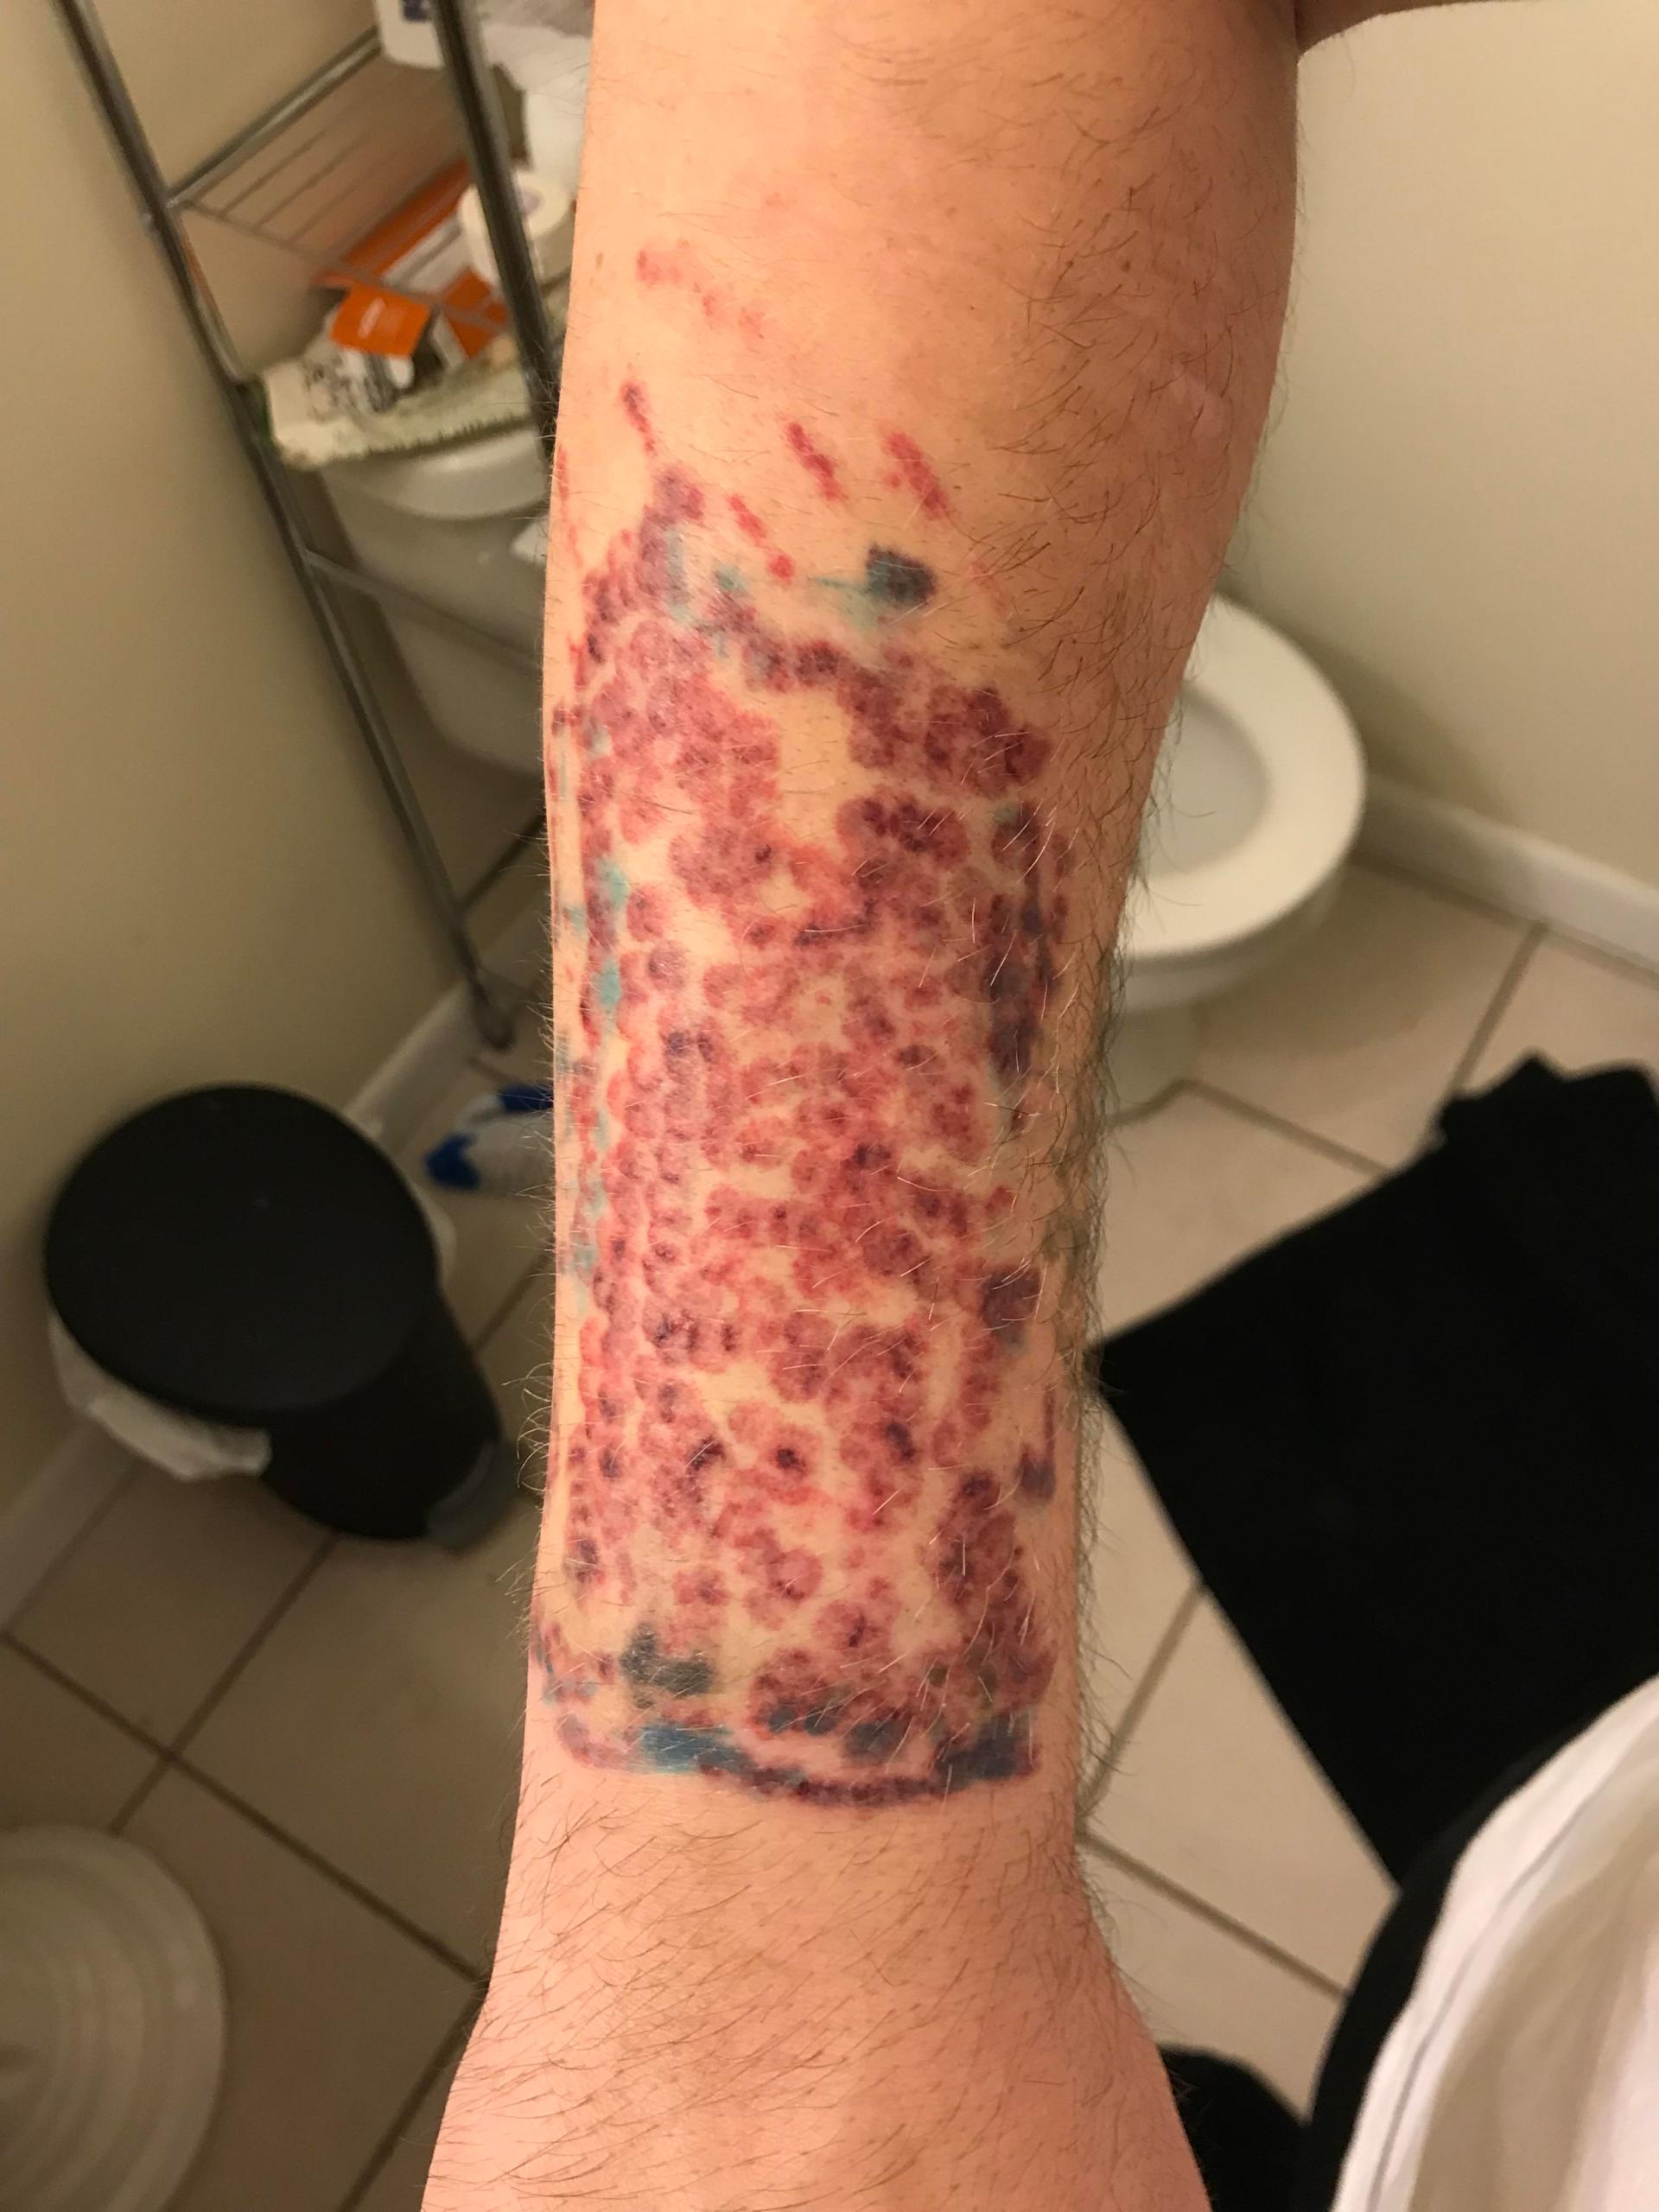 Laser tattoo removal : HadToHurt